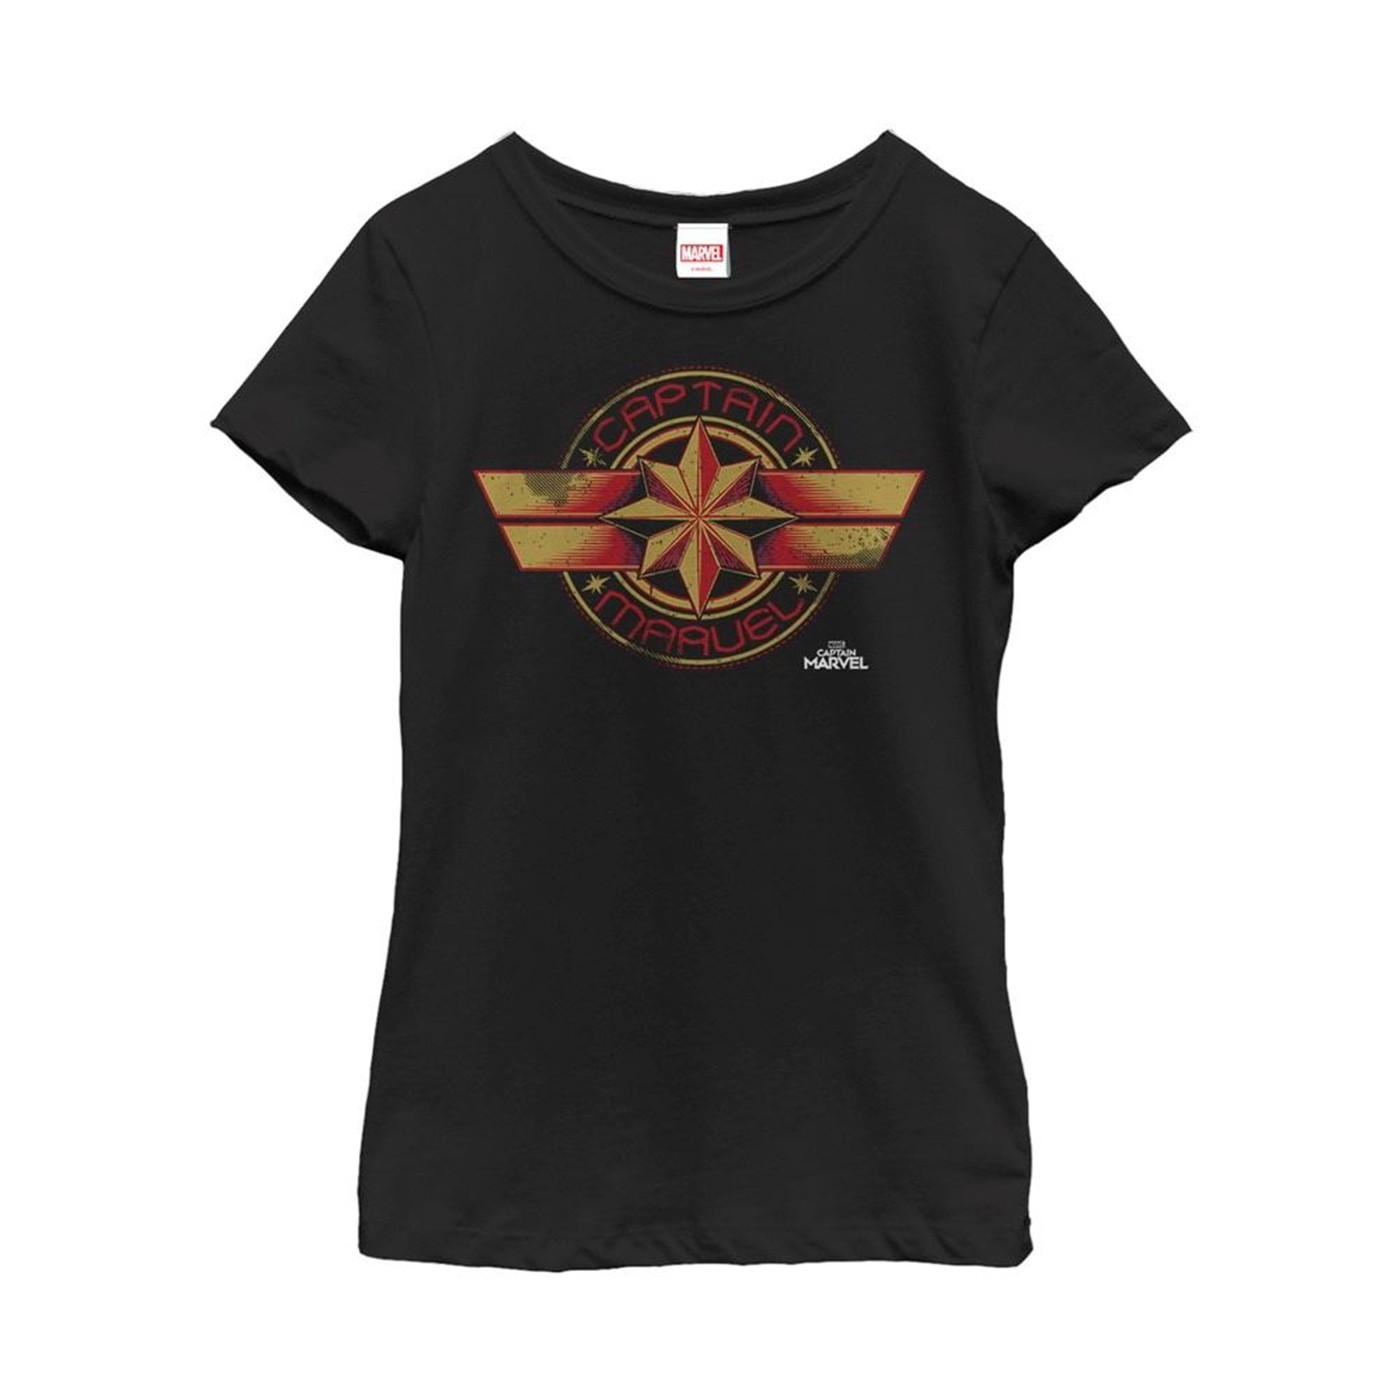 Captain Marvel Retro Star Emblem Girl's T-Shirt